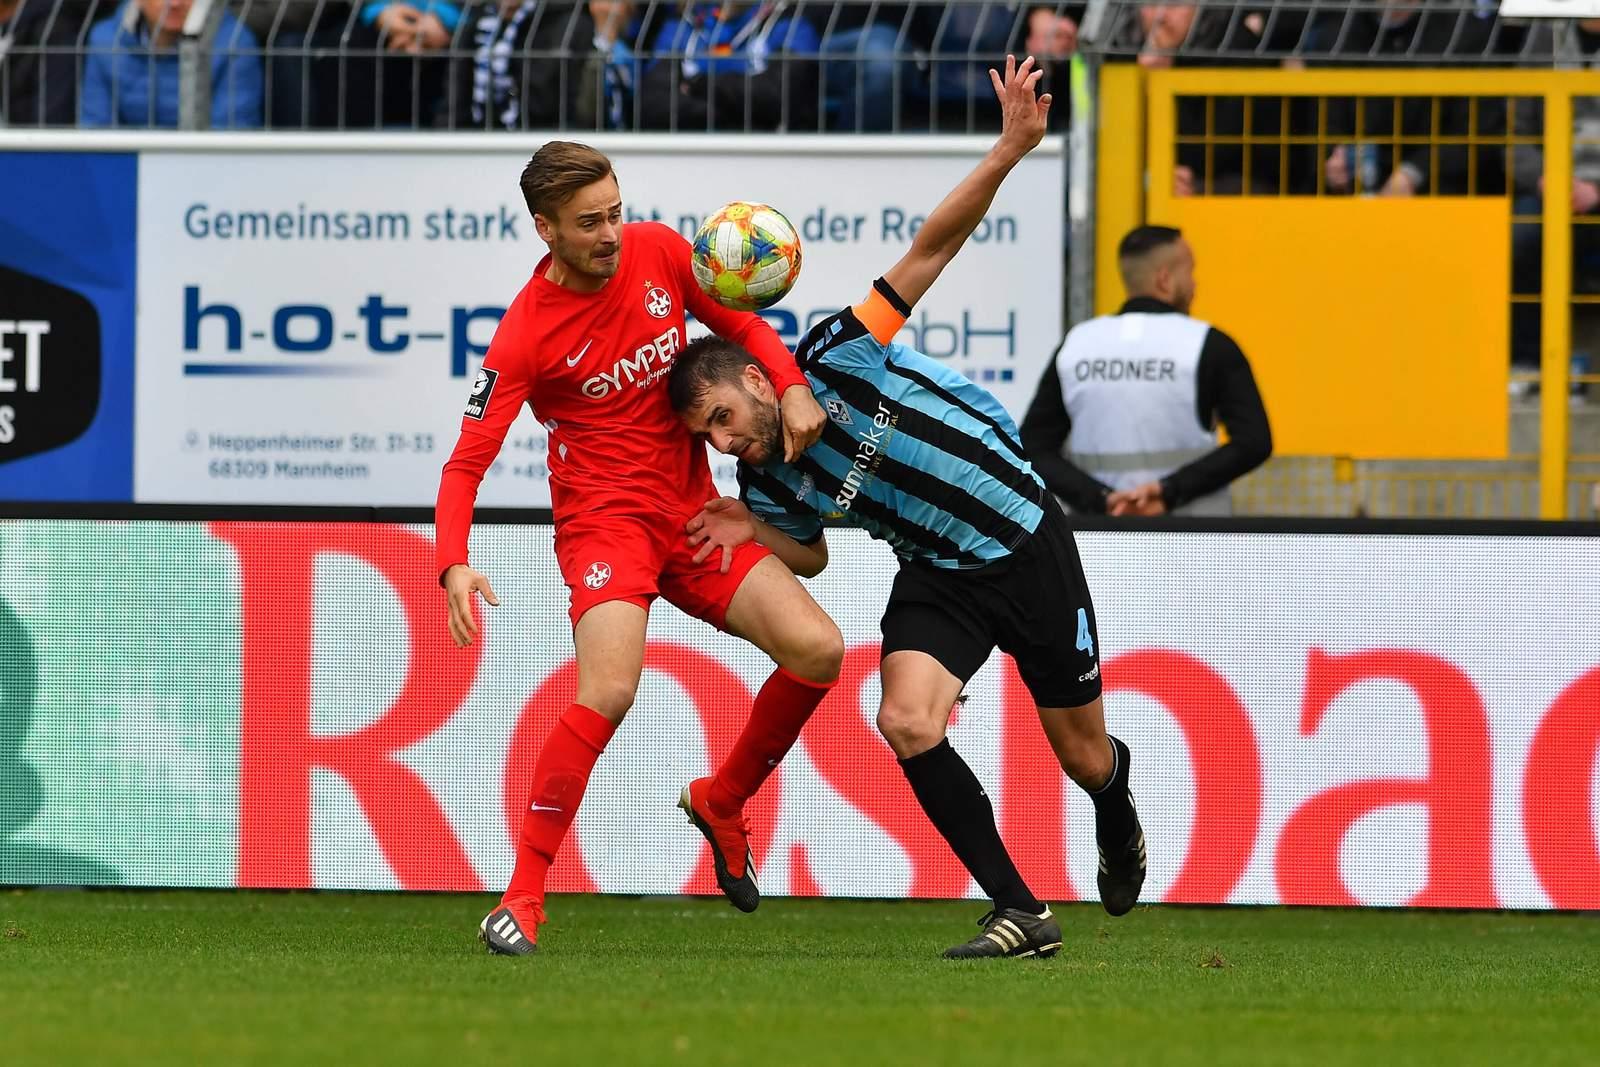 Lucas Röser vom FCK (l.) gegen Mannheims Kevin Conrad.